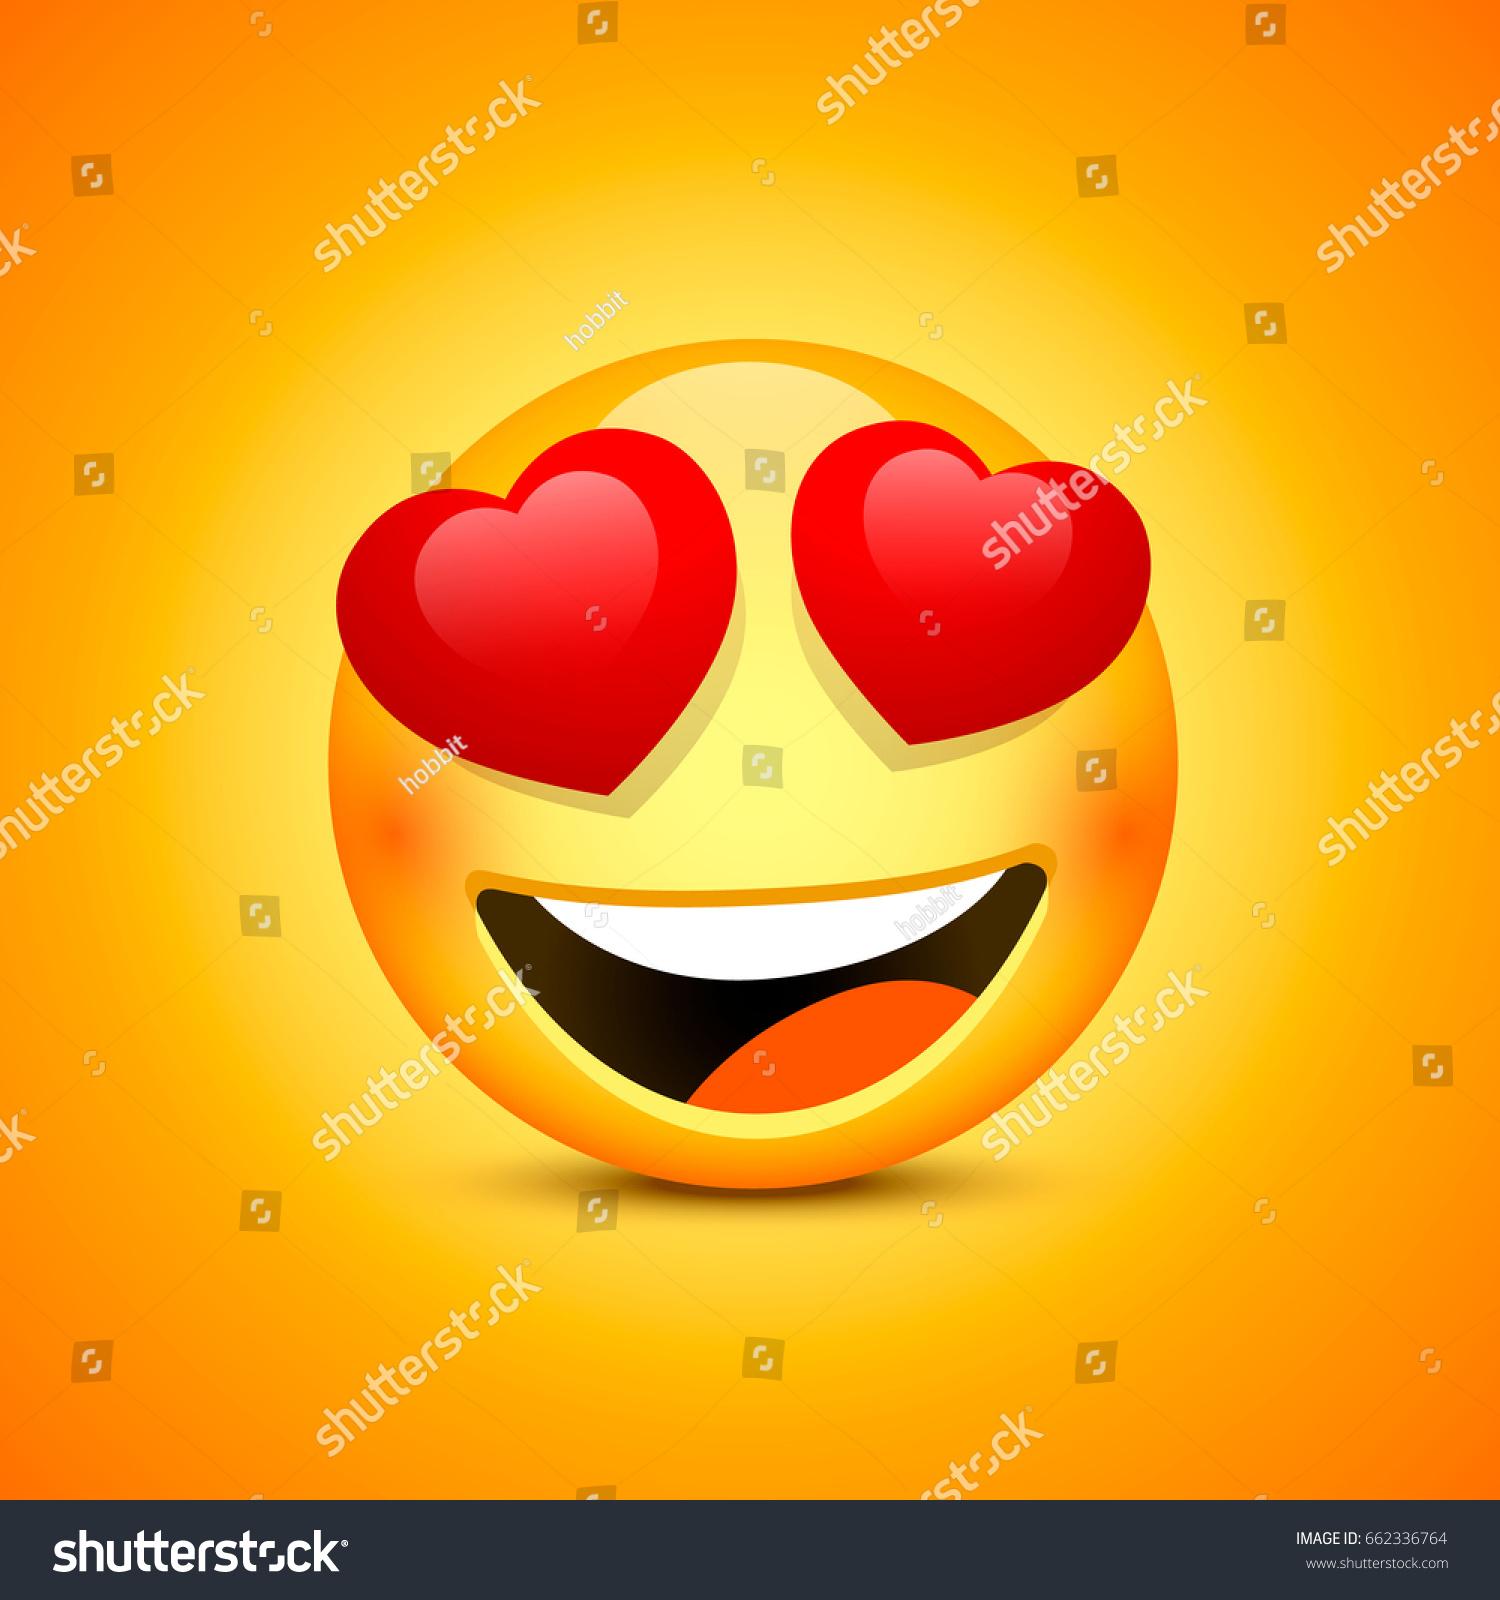 Smiling Face Emotions Love Happy Eyes Vectores En Stock ...